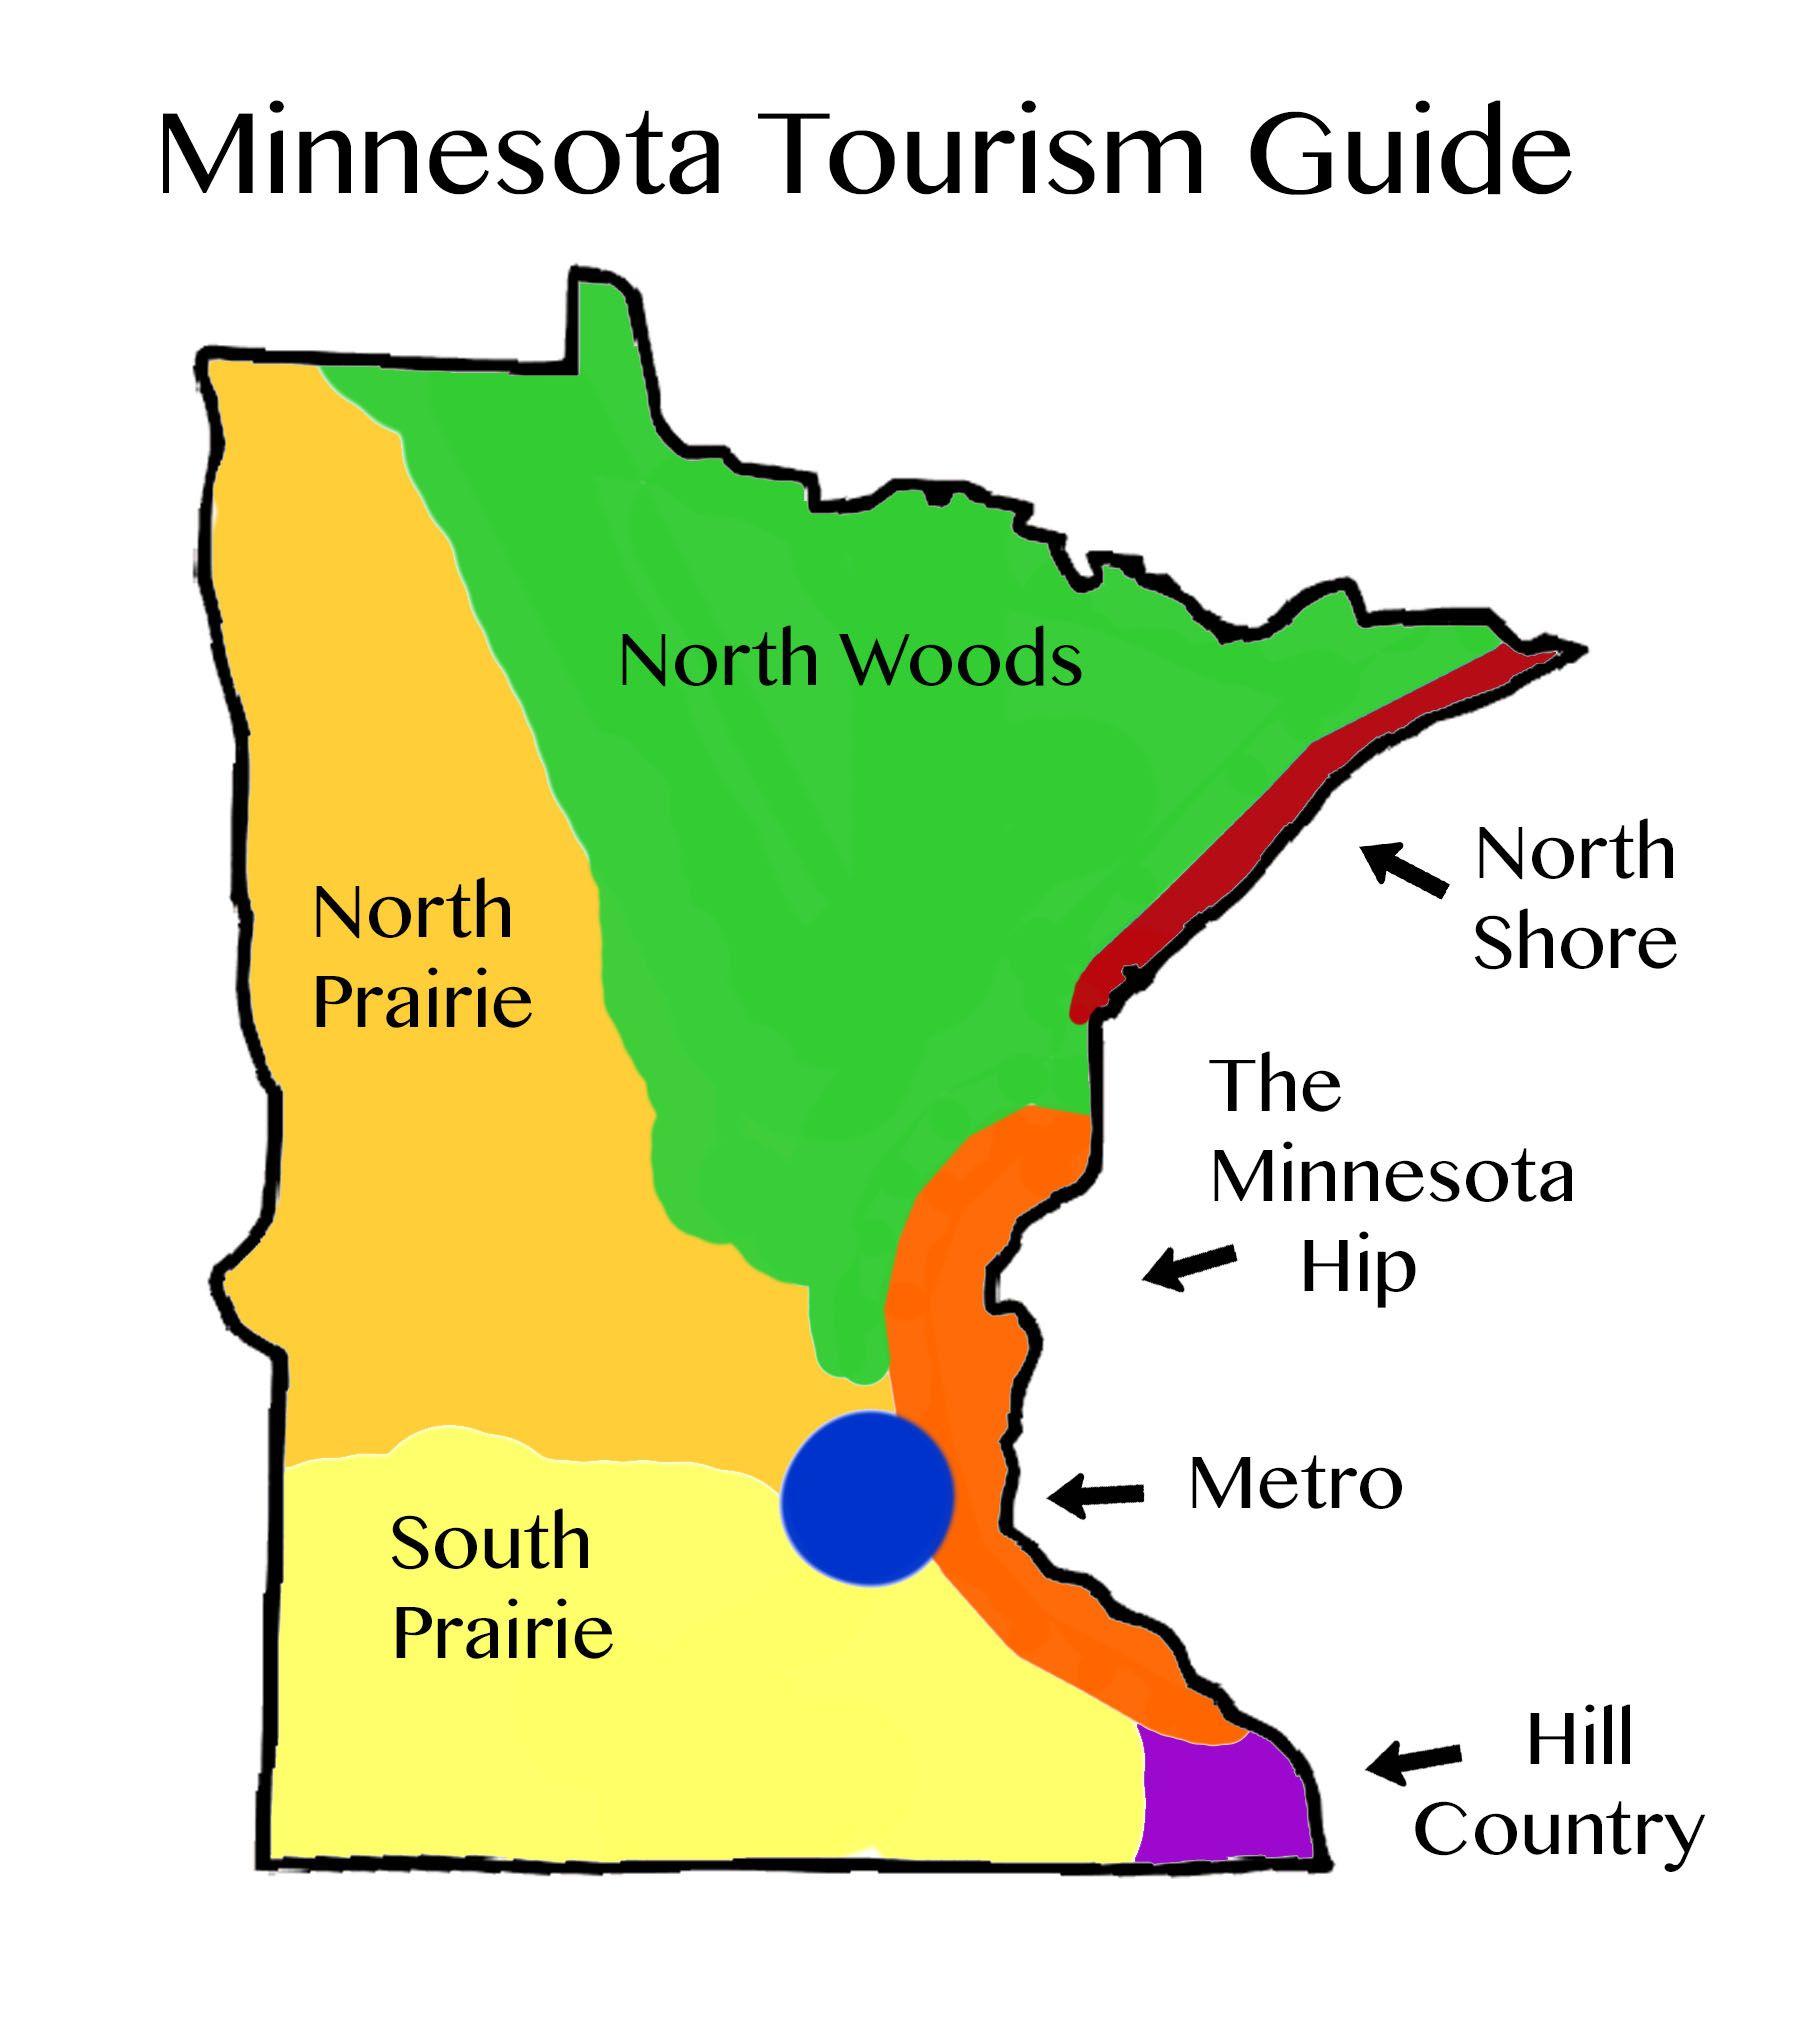 Tourism Map For Minnesota Where To Go For Your Next Adventure